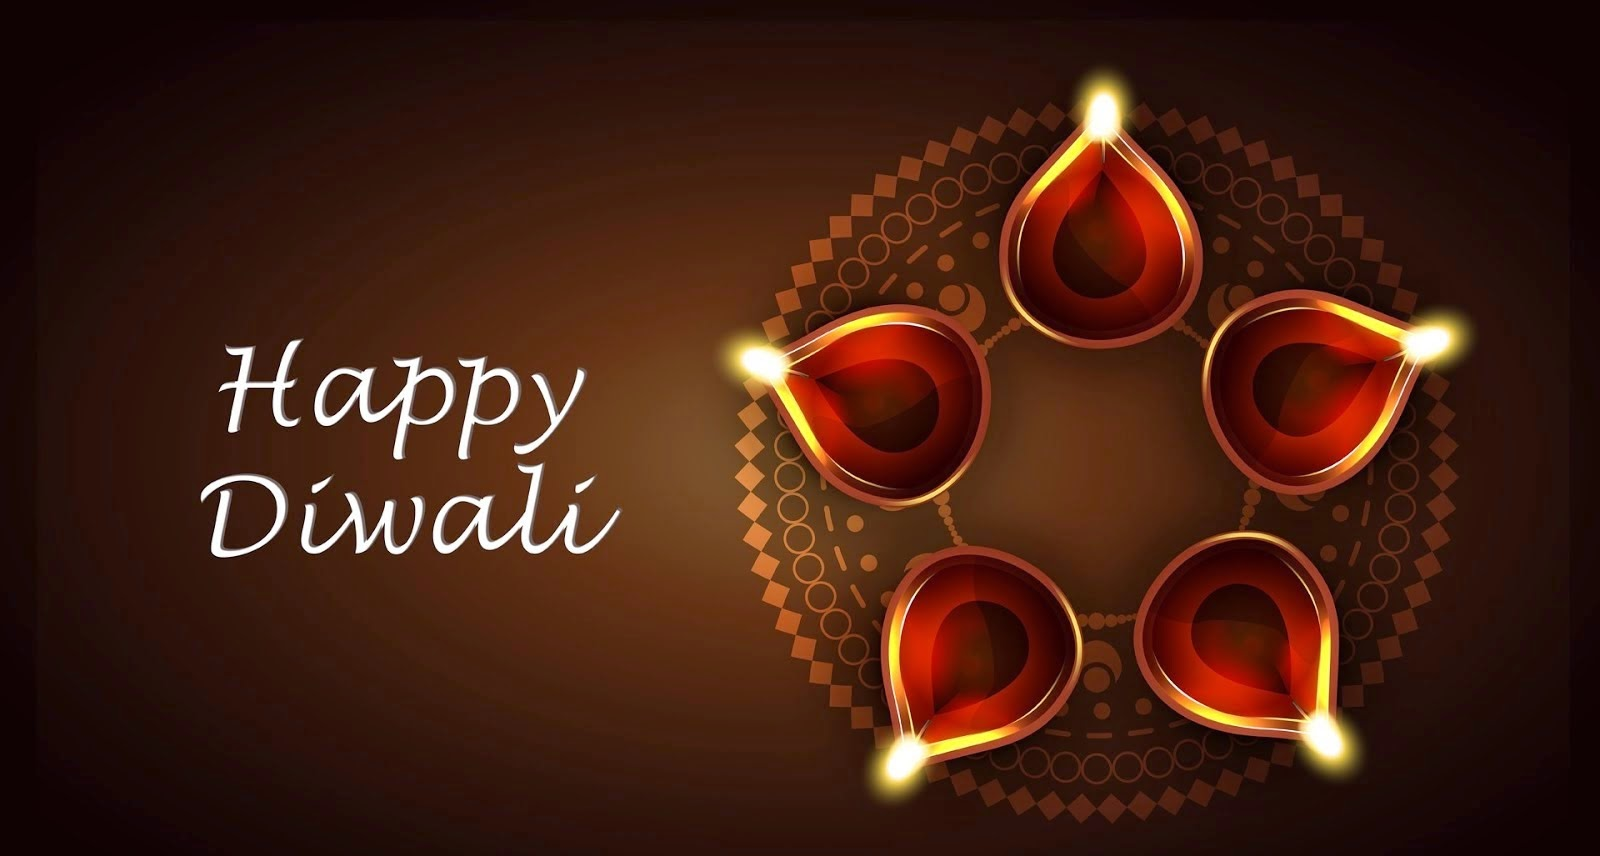 Happy Diwali 2015 | Diwali Festival 2015 WallPapers, SMS, Videos ... for Happy Deepavali Wallpaper Hd Widescreen  155sfw